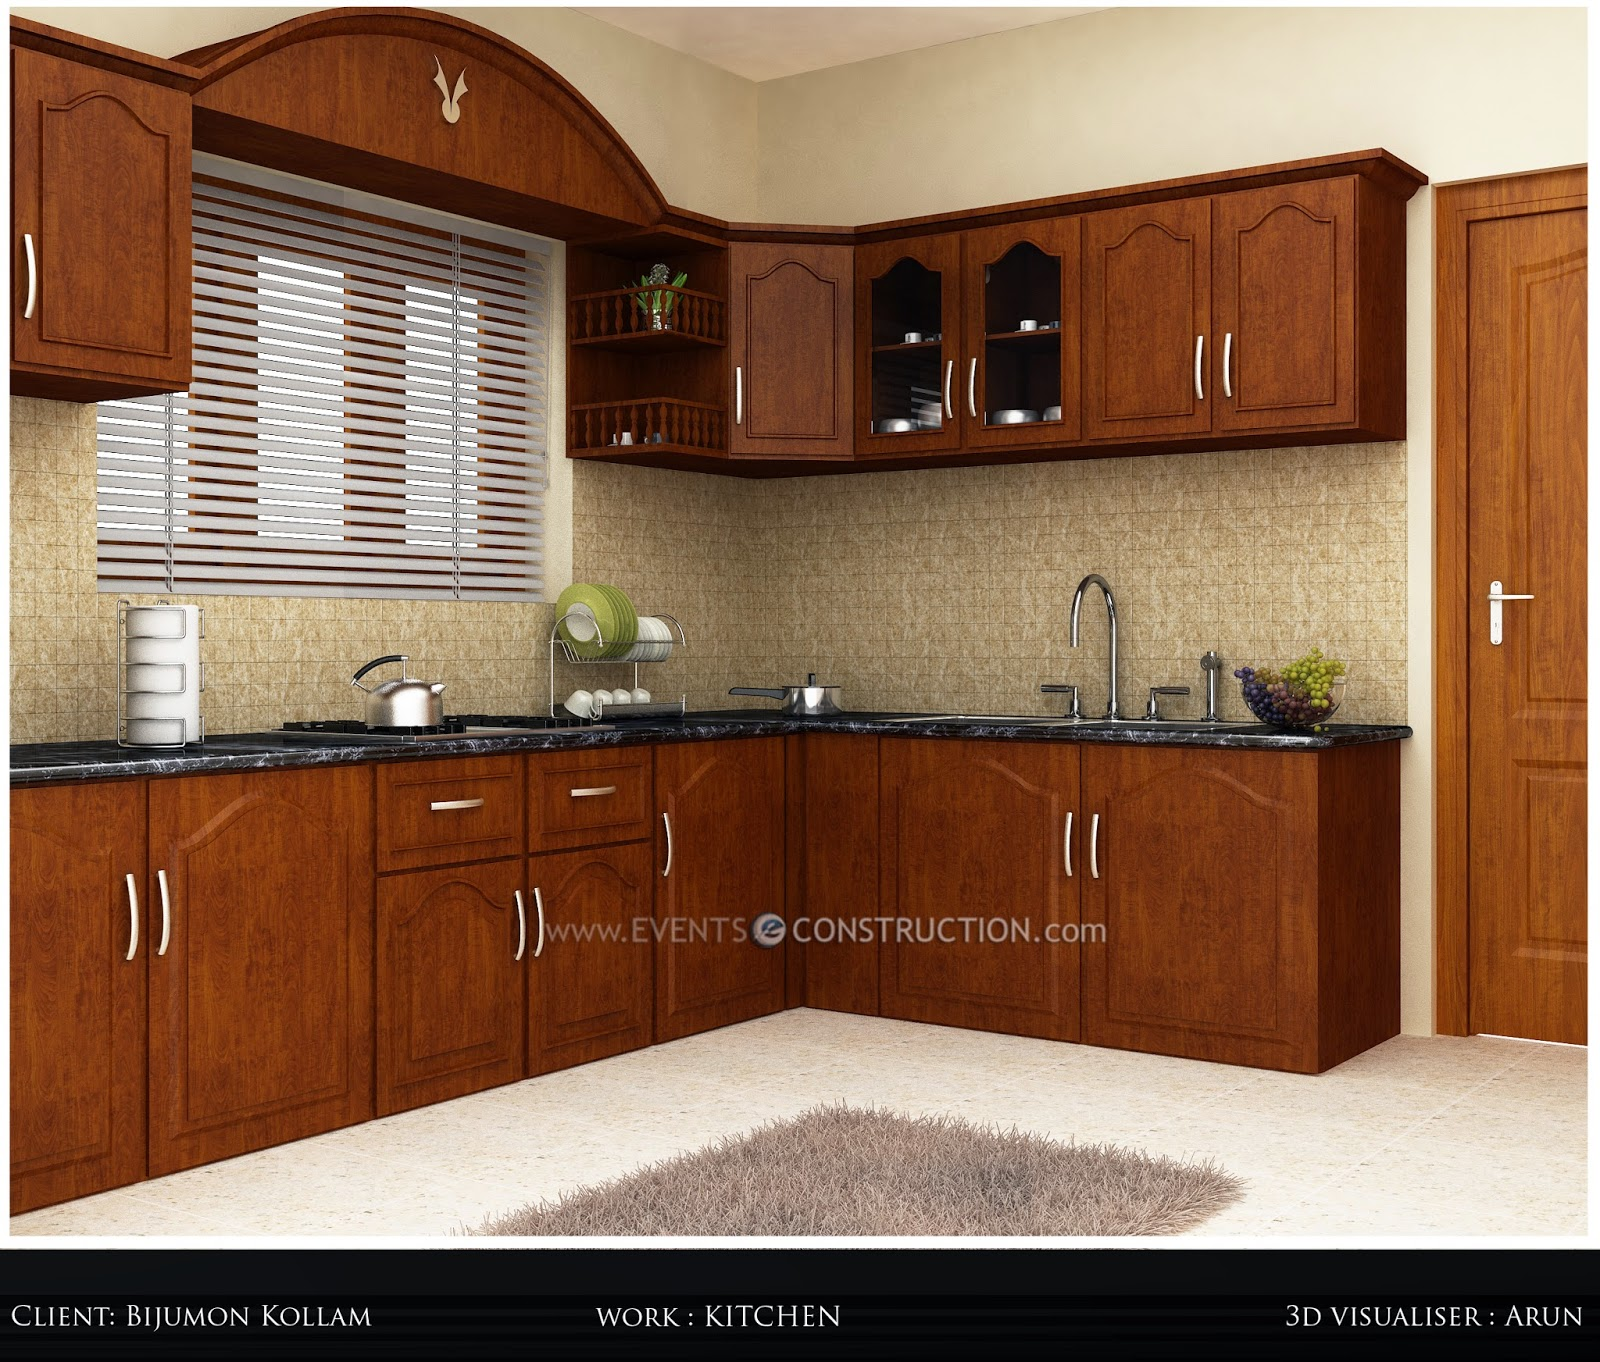 evens construction pvt simple kerala kitchen interior kitchen designs schiffini simple contemporary kitchen interior